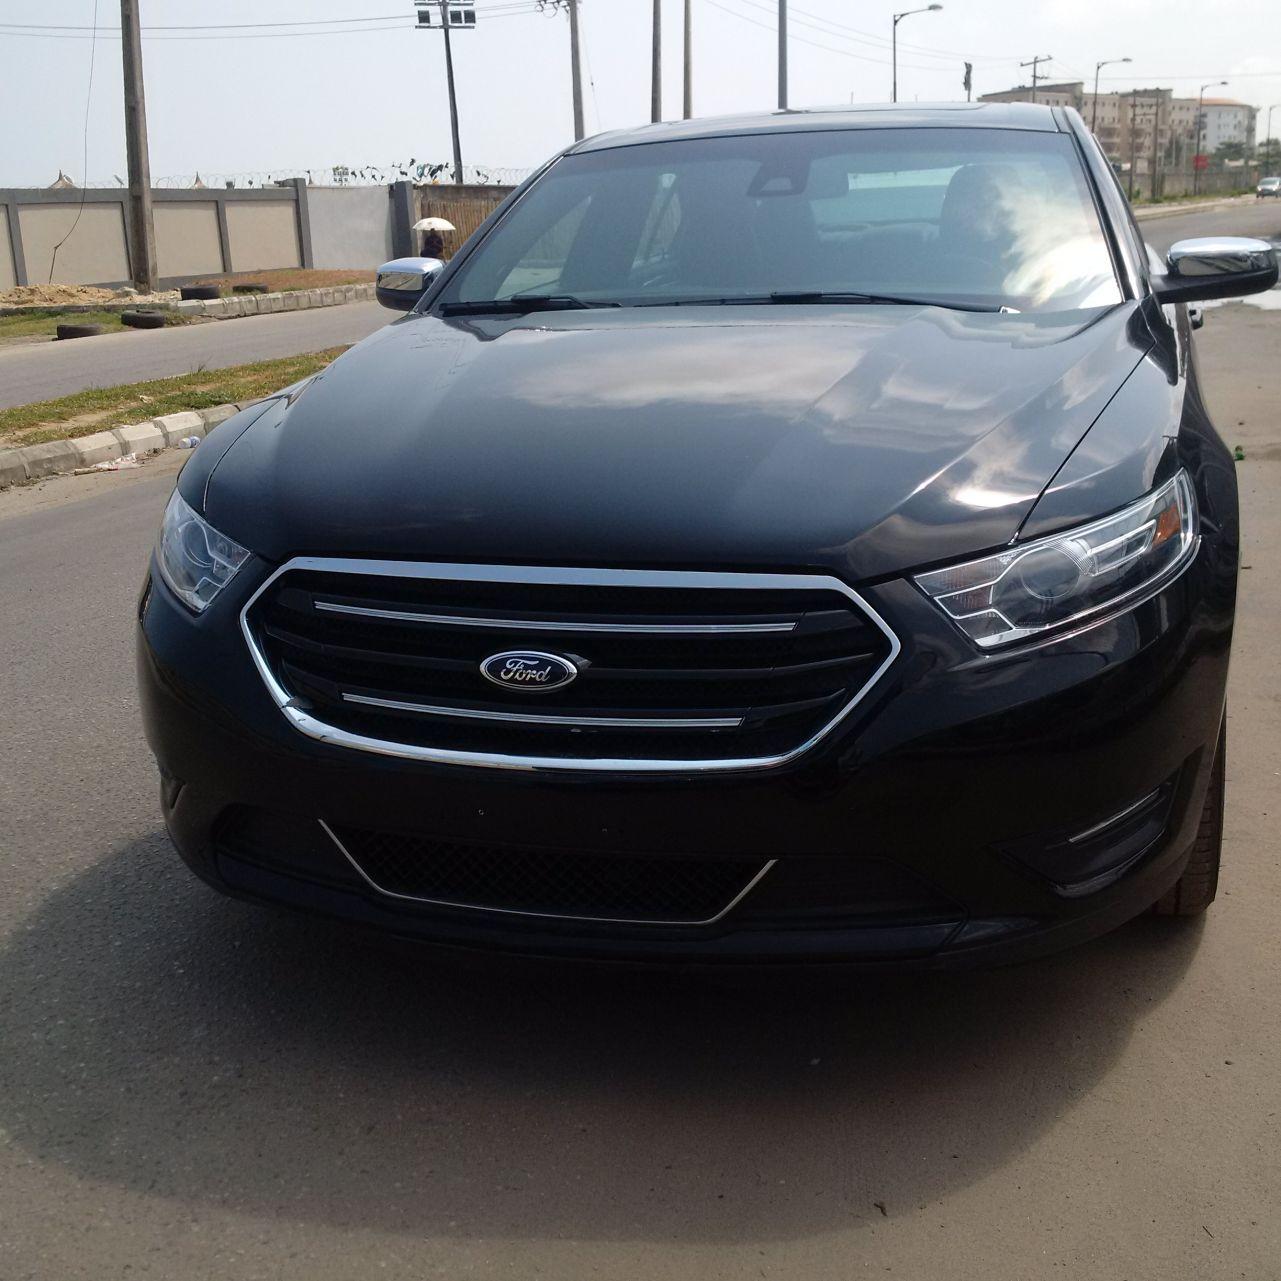 brand new toyota camry price in nigeria pajak grand avanza 2016 brandnew ford taurus autos